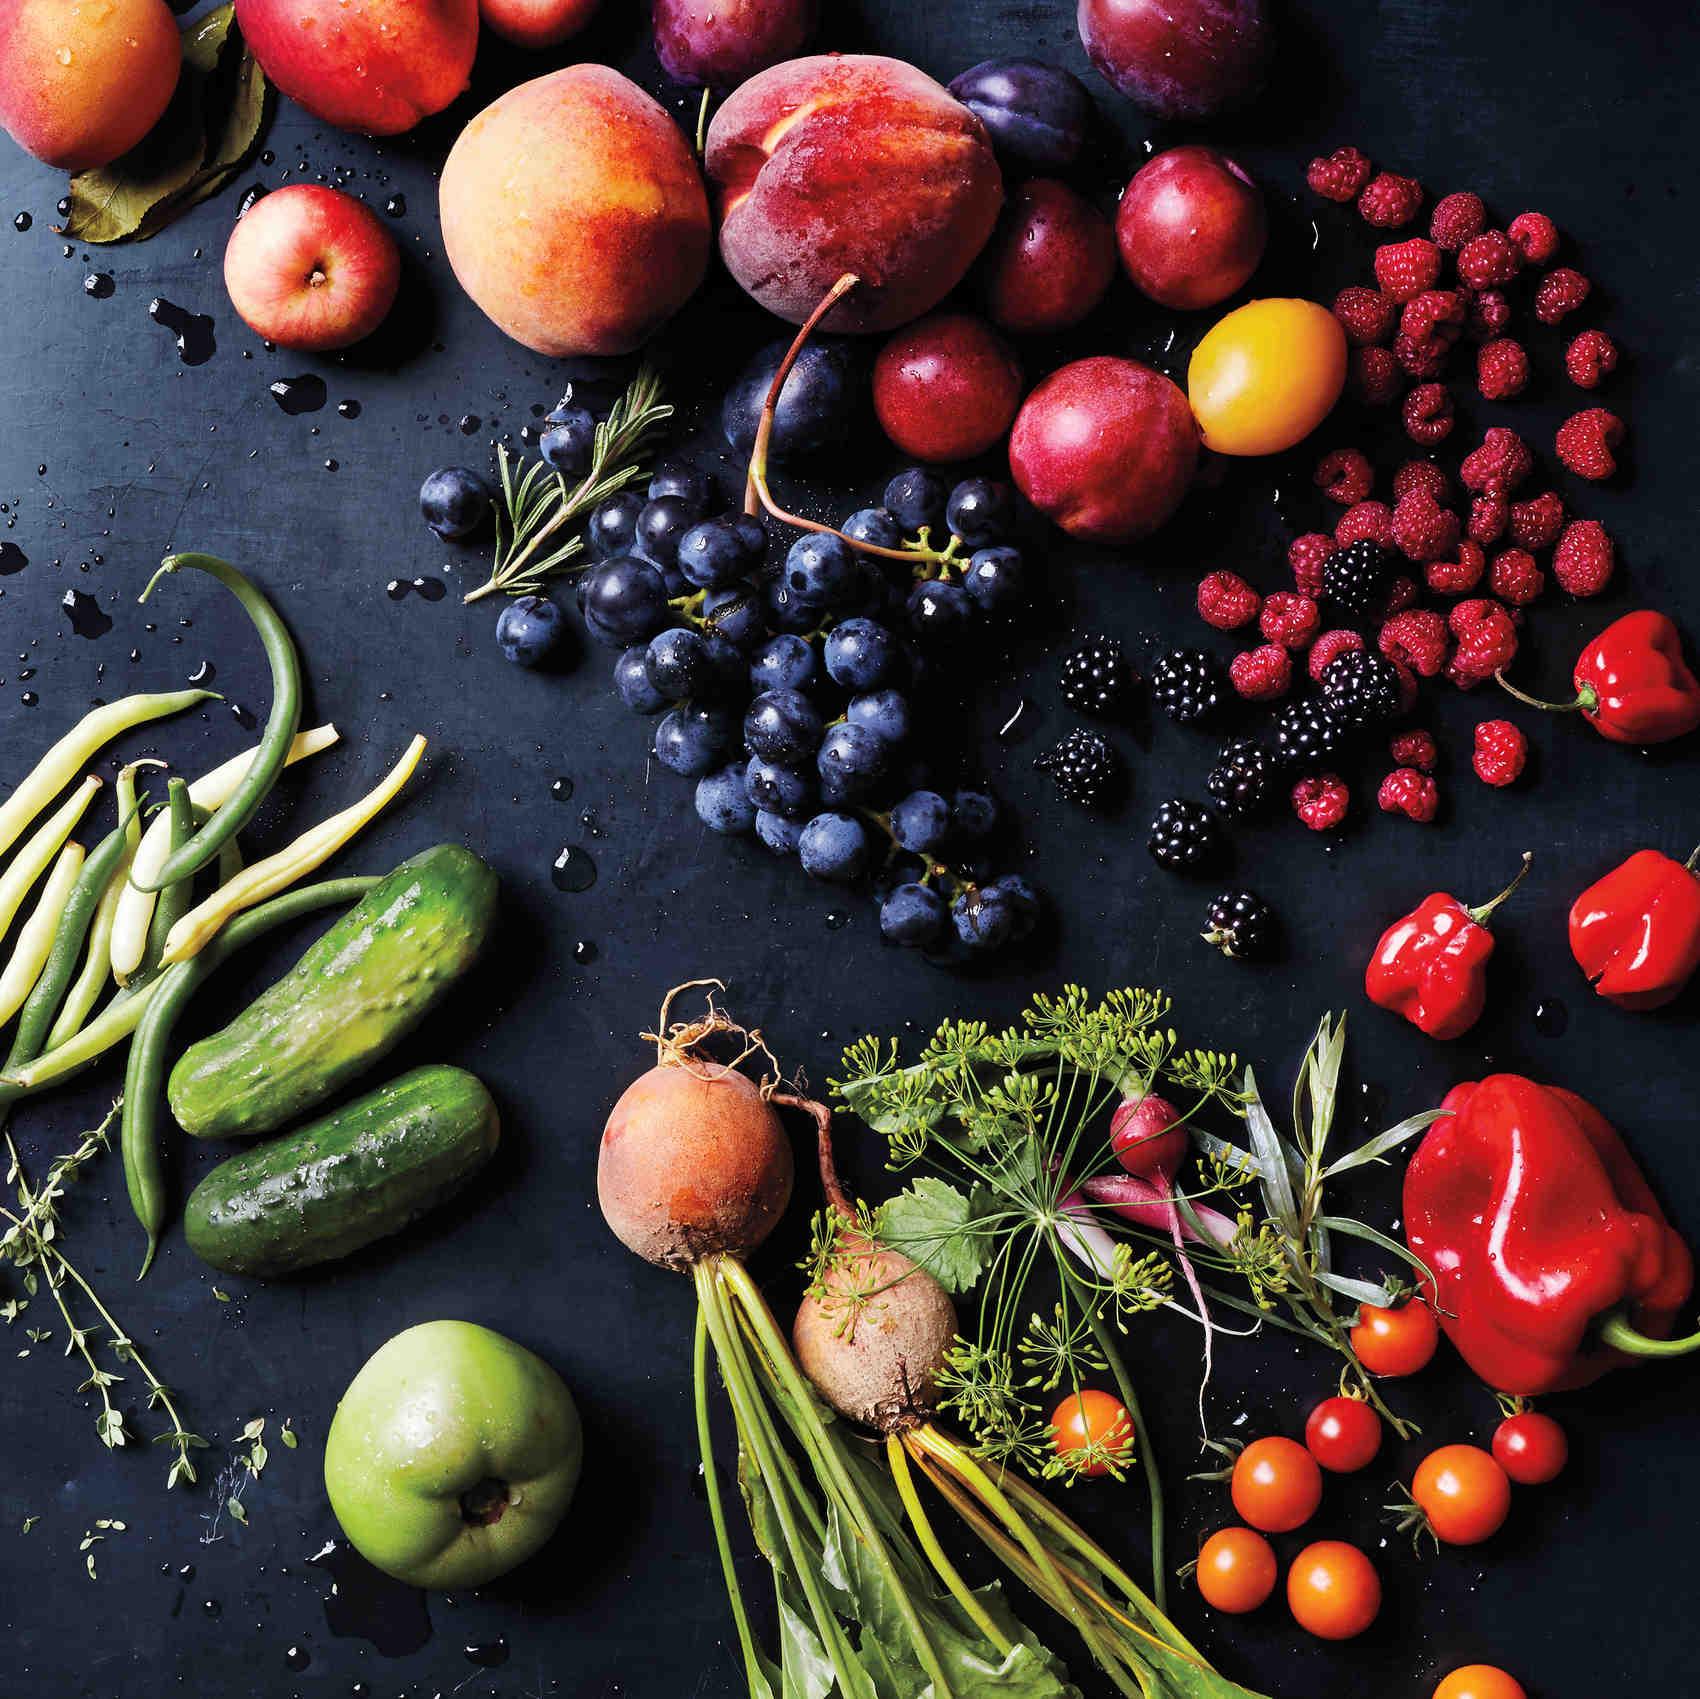 martha-produce-opener-with-veggies-098-d111614.jpg